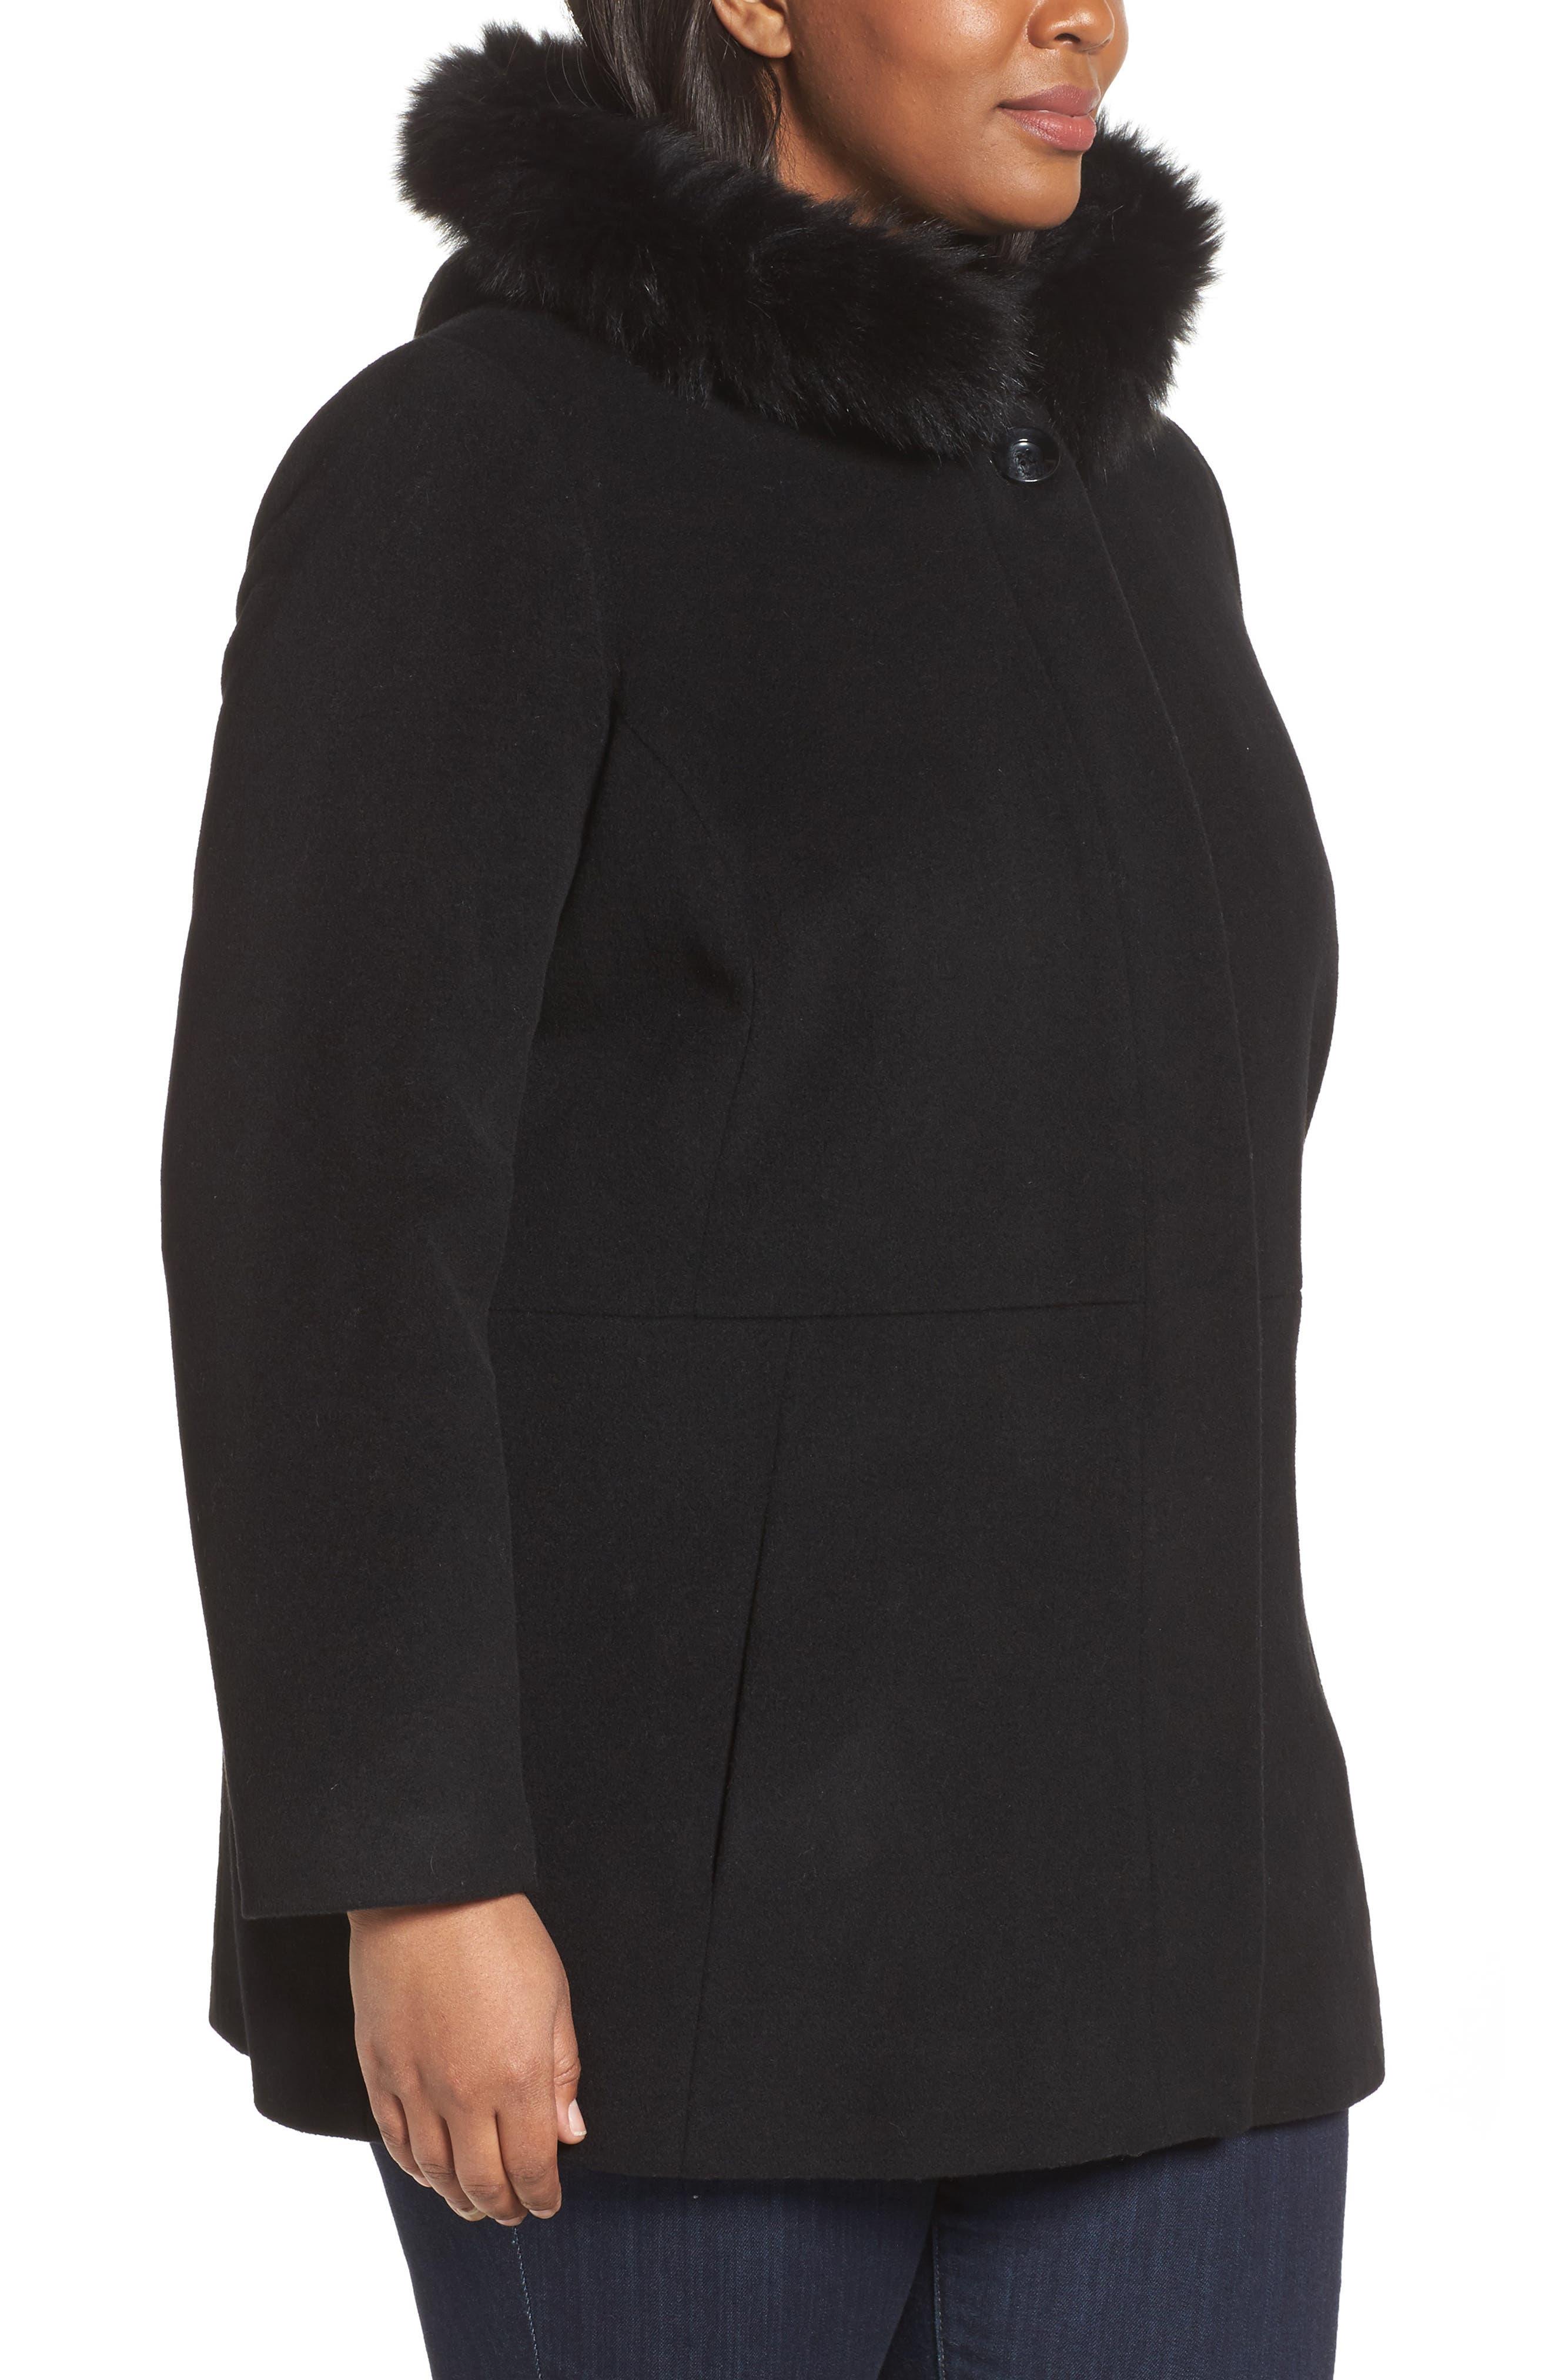 Alternate Image 3  - Sachi Genuine Fox Fur Trim Hooded Wool Blend Jacket (Plus Size)